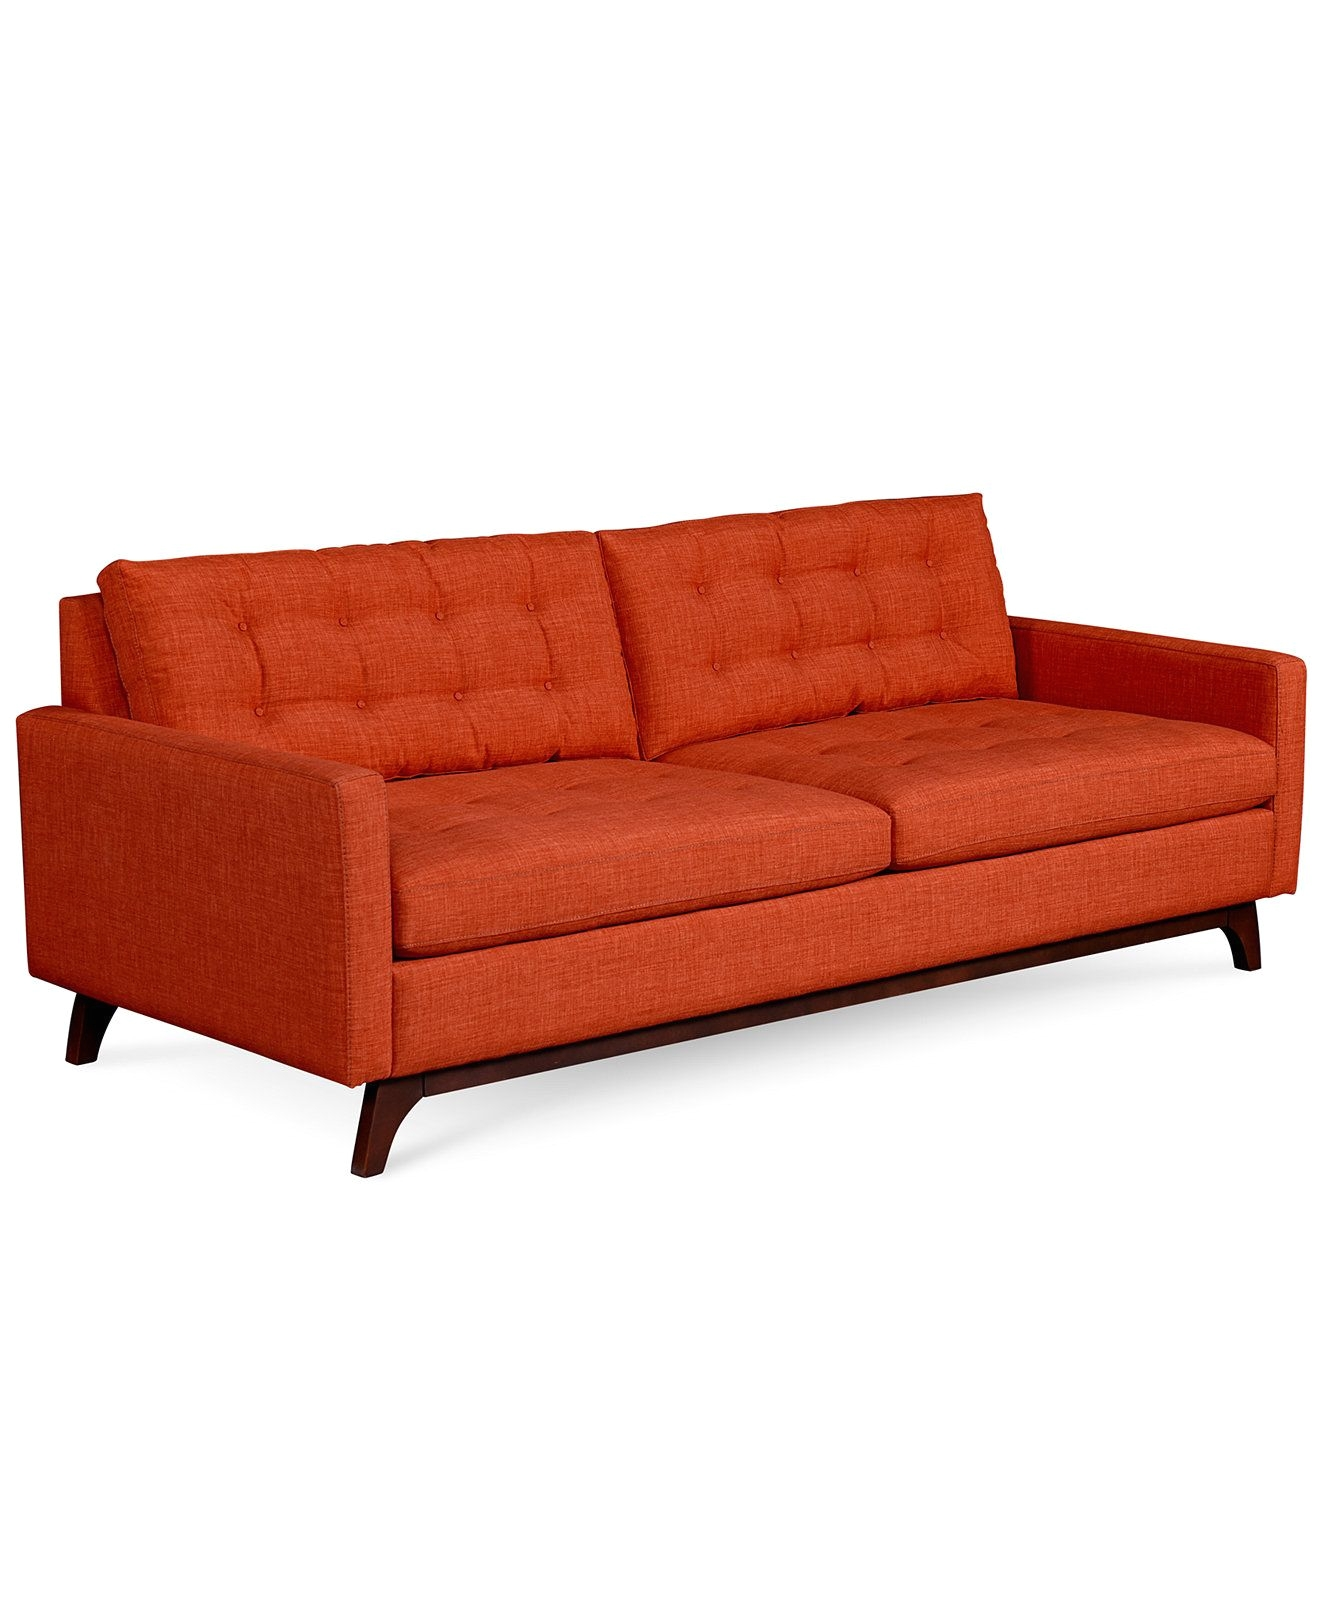 cool macy s sofas luxury macy s sofas 28 sofa room ideas with macy s sofas http sofascouch com macys sofas 20636